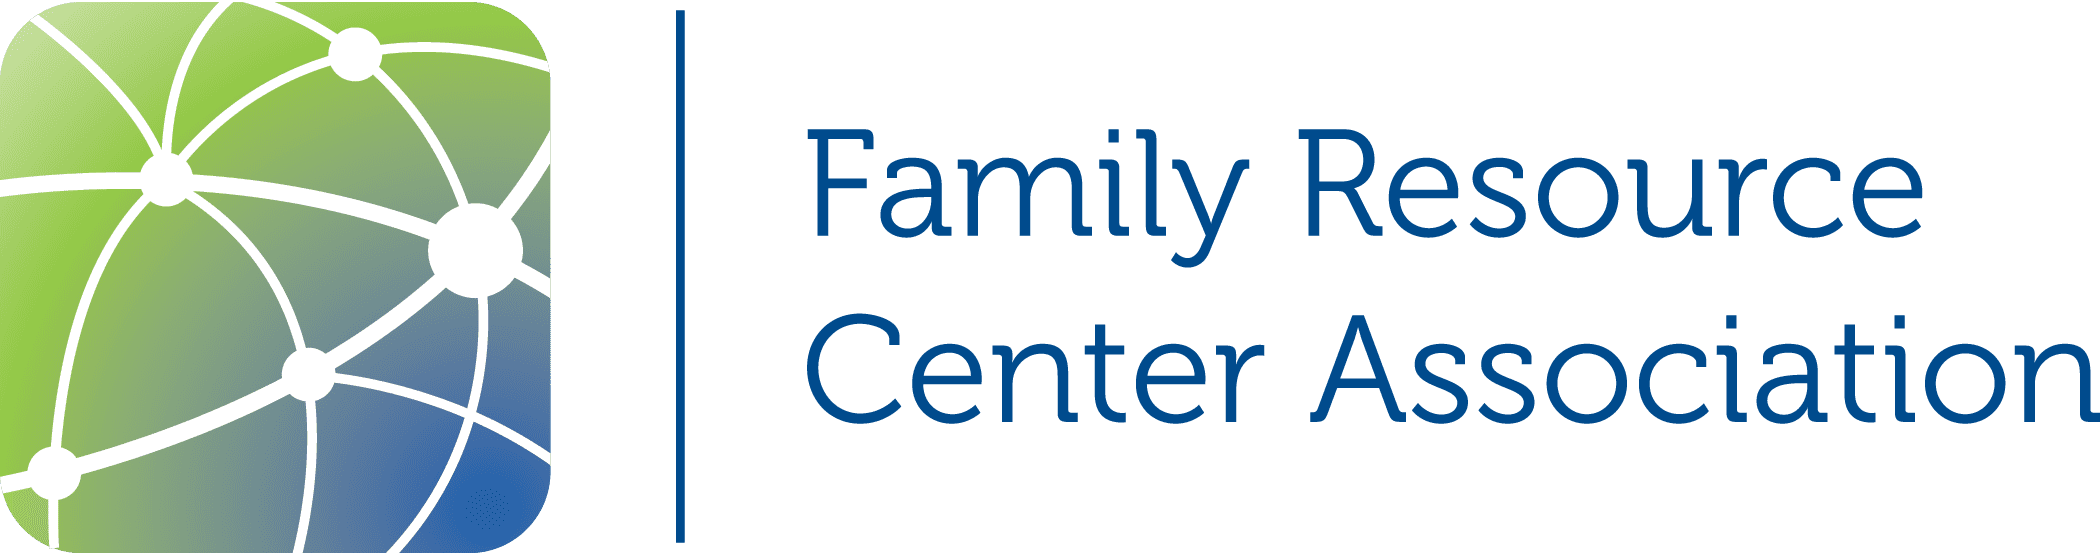 Family Resource Center Association